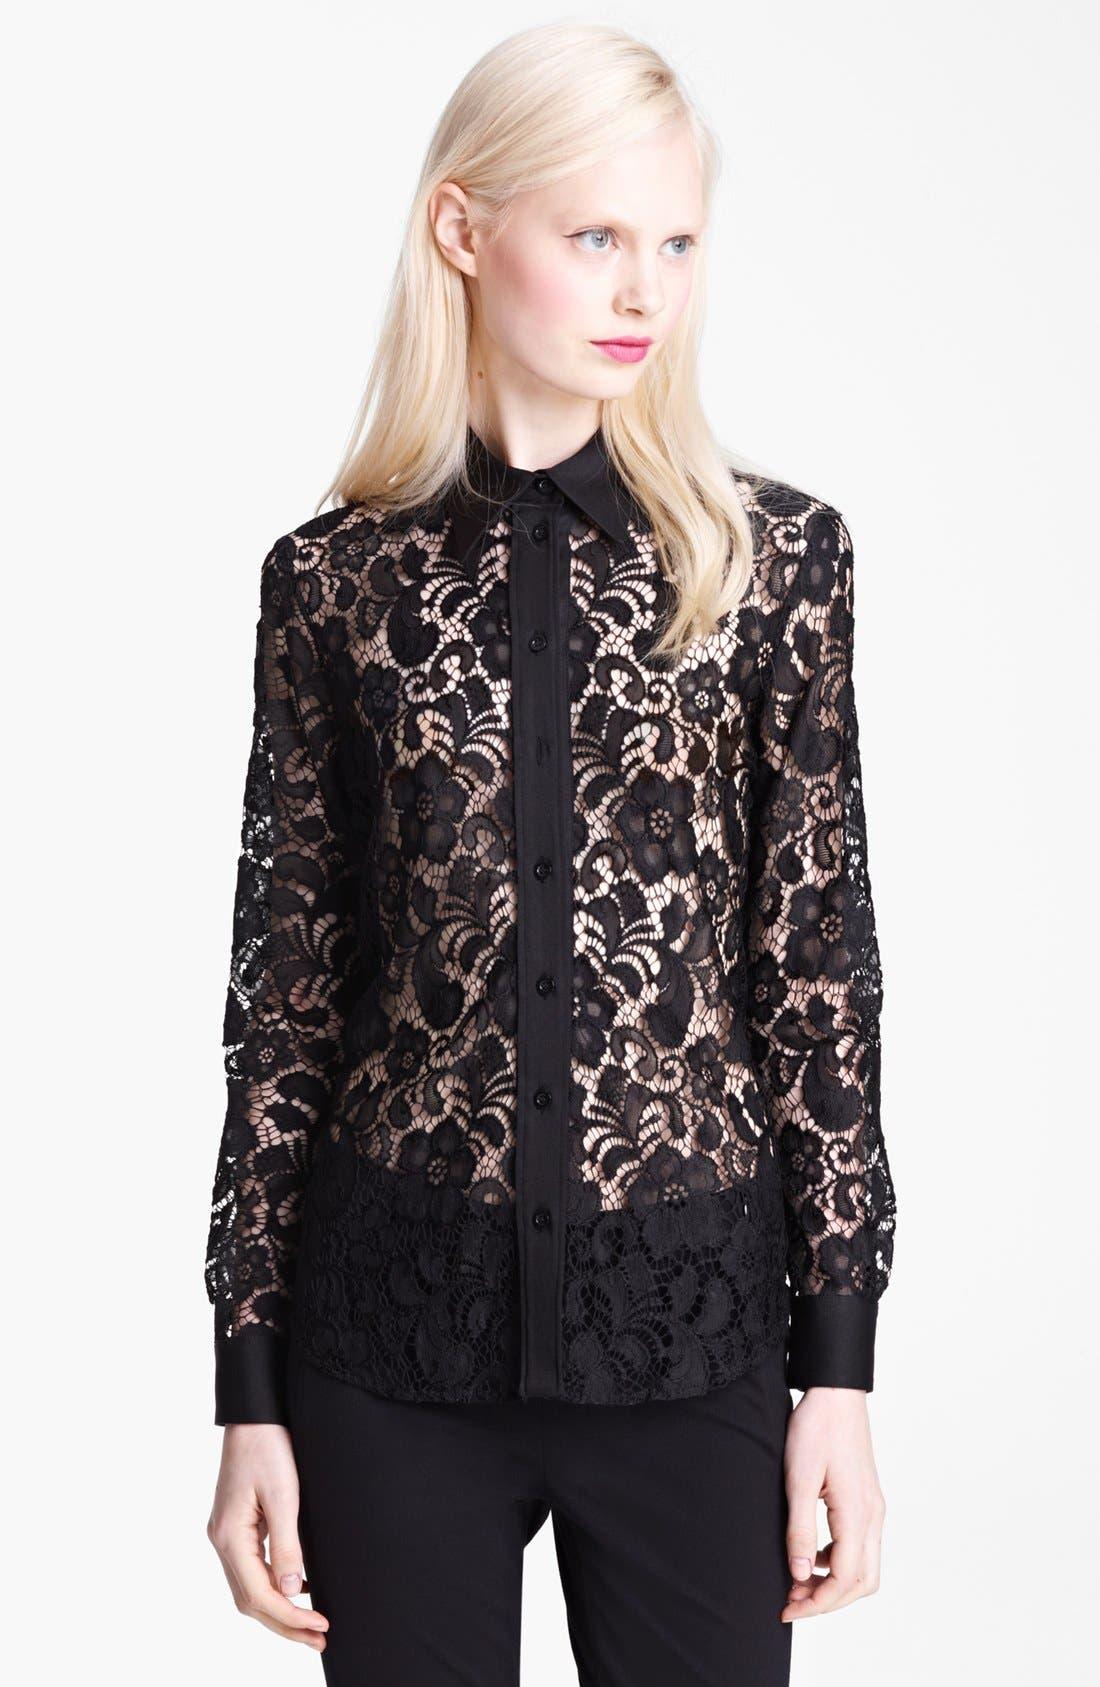 Main Image - Moschino Cheap & Chic Lace Blouse